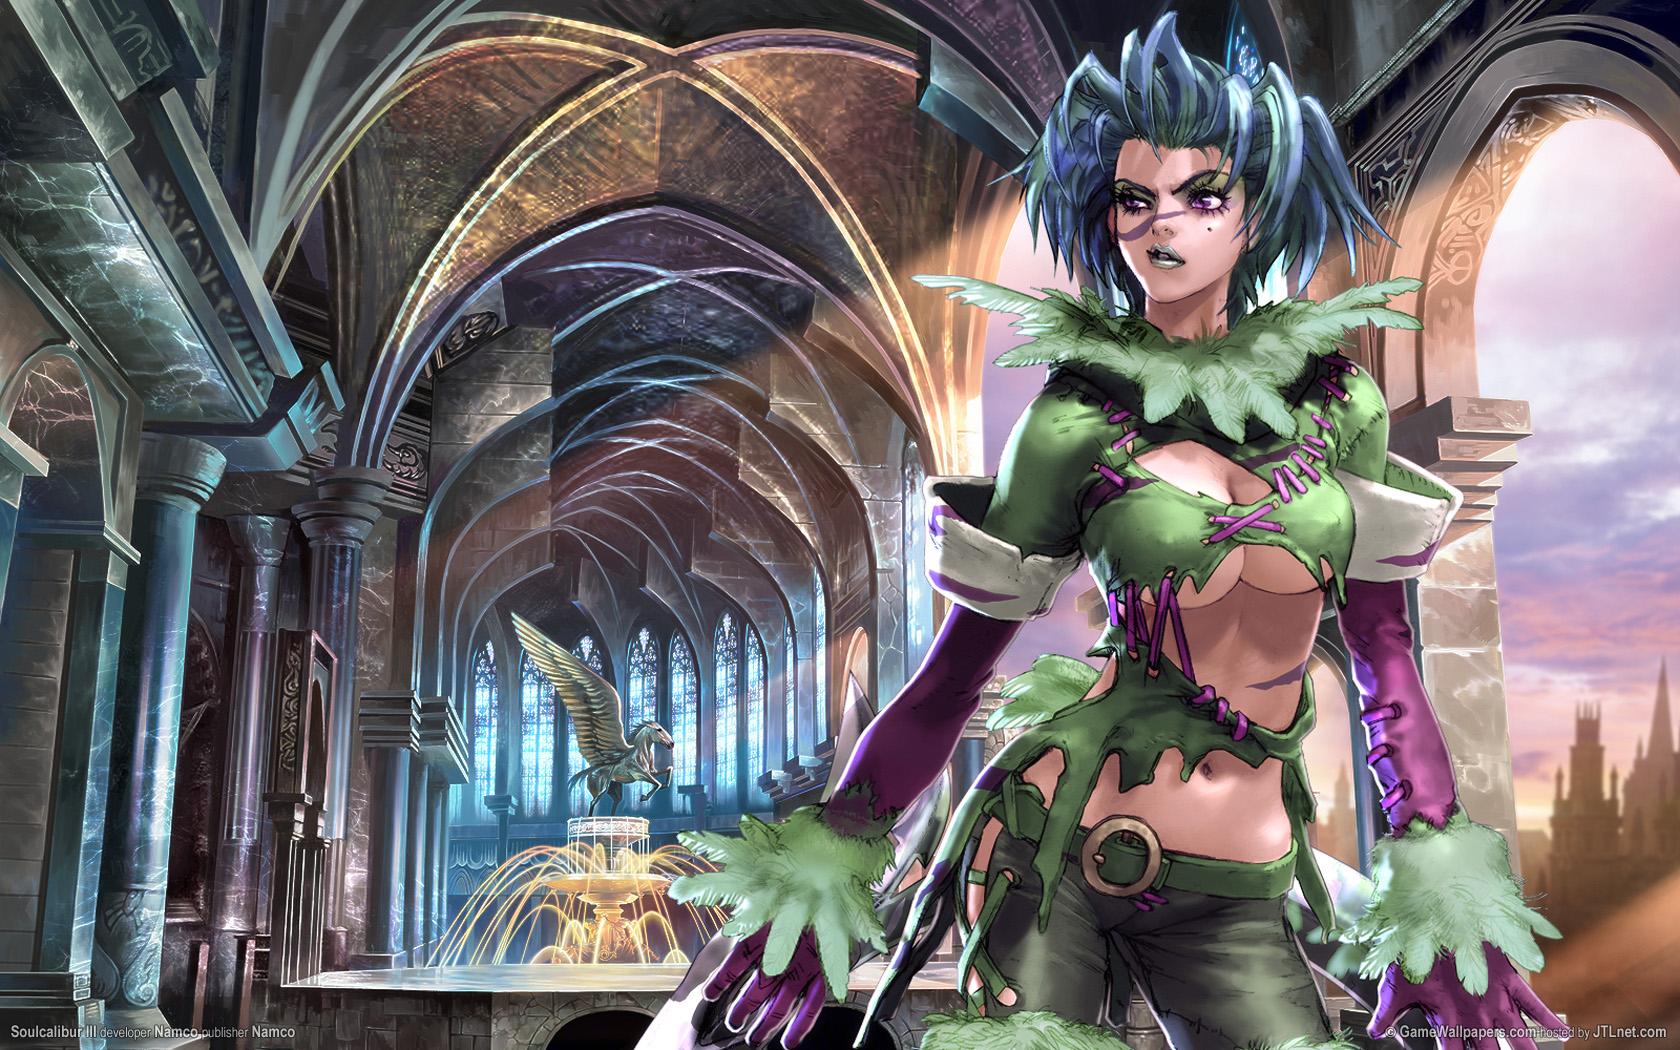 Soulcalibur wallpapers pictures images - Soul calibur wallpaper ...